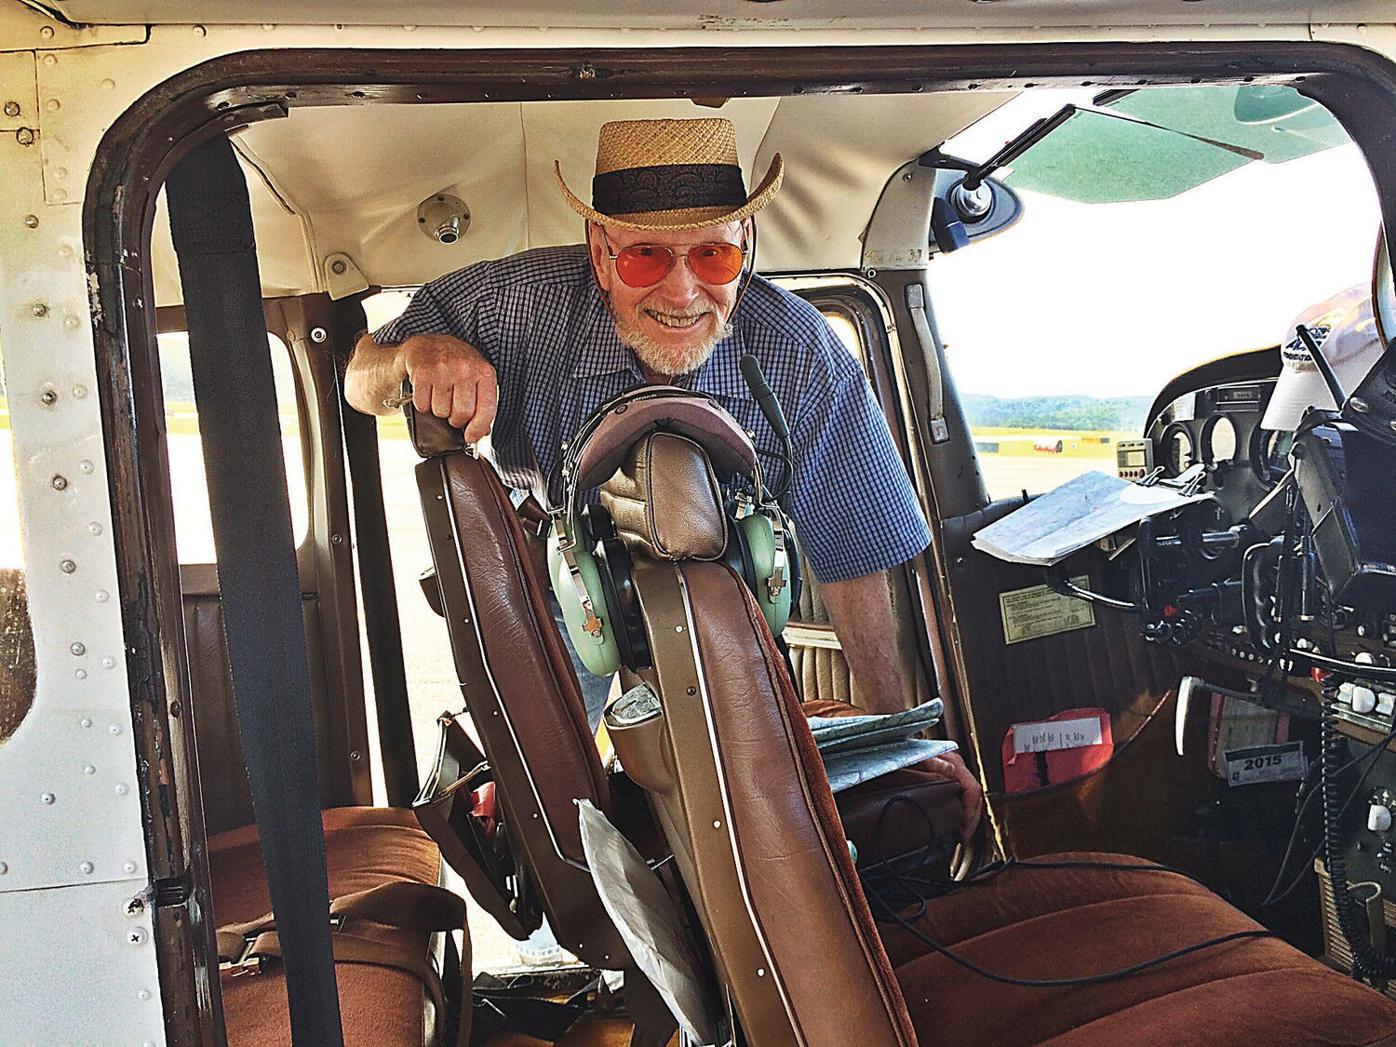 Windsor pilot, 89, killed in crash had 'just a huge sense of adventure'